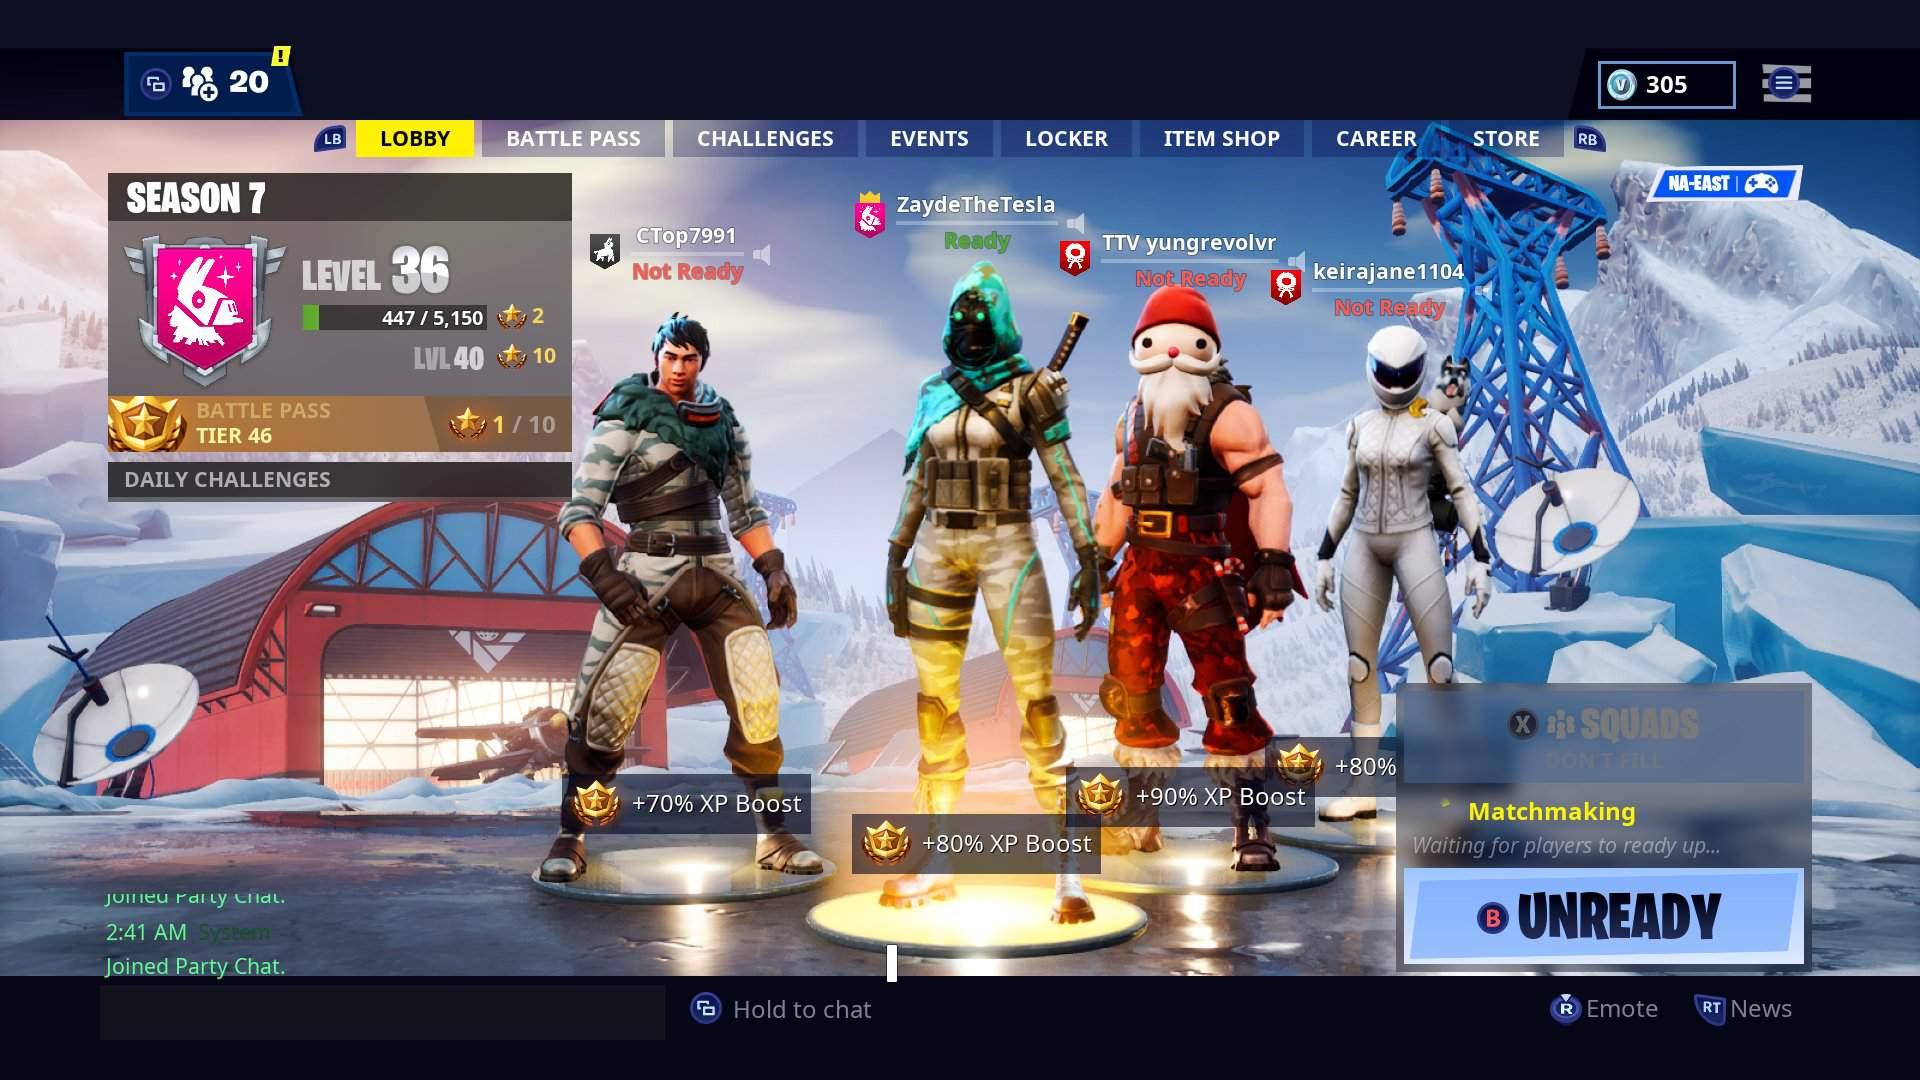 I'm starting to twitch stream w/anyone | Fortnite: Battle Royale